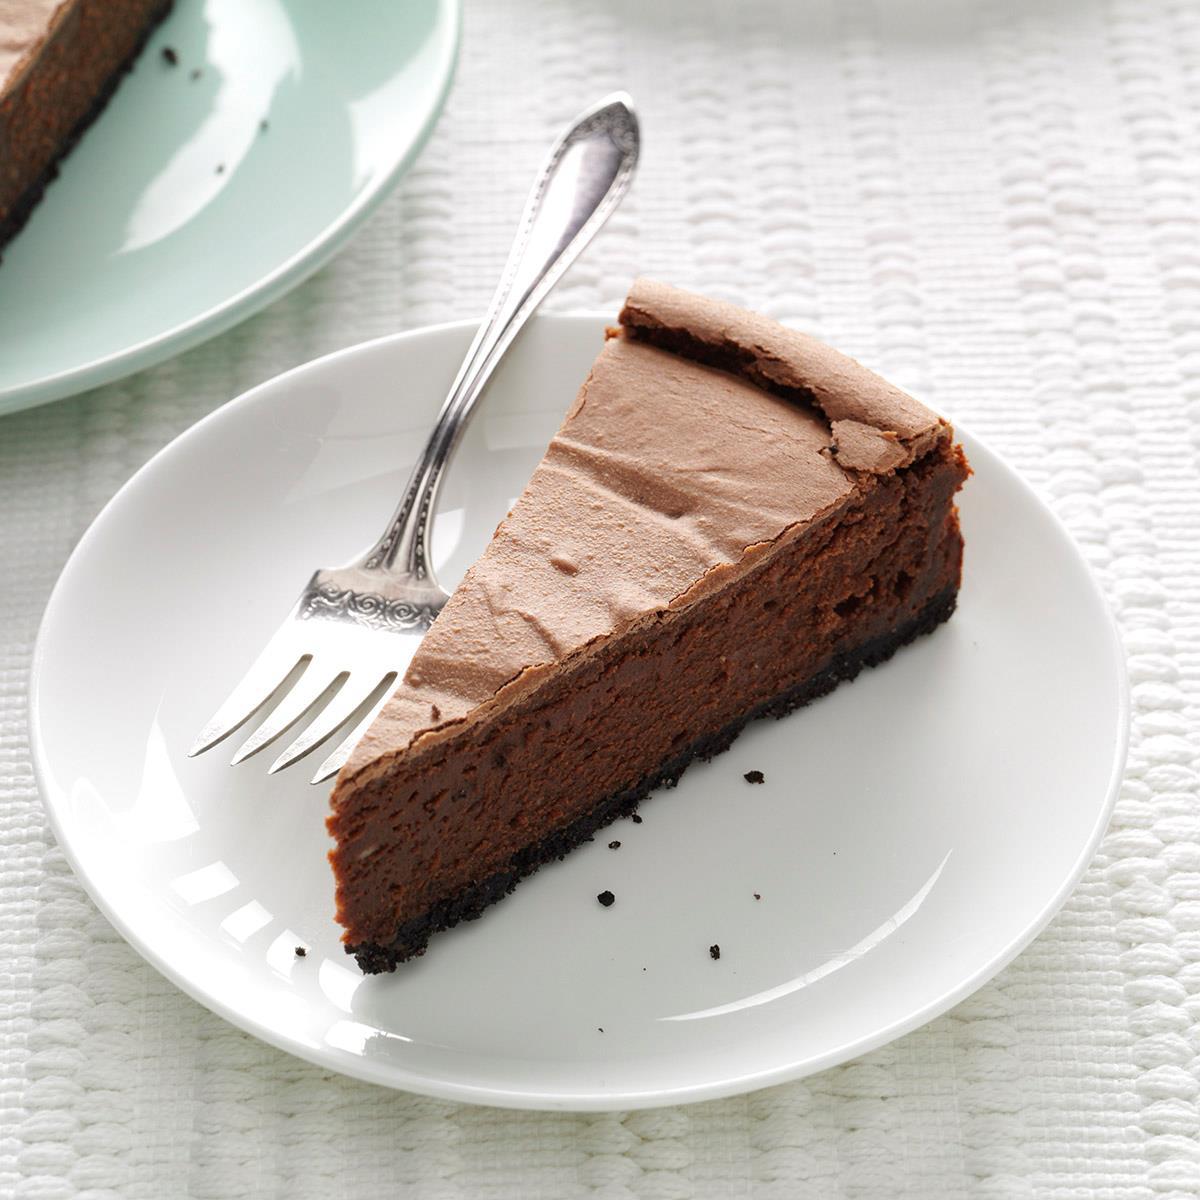 Chocolate Cheesecake Recipe | Taste of Home